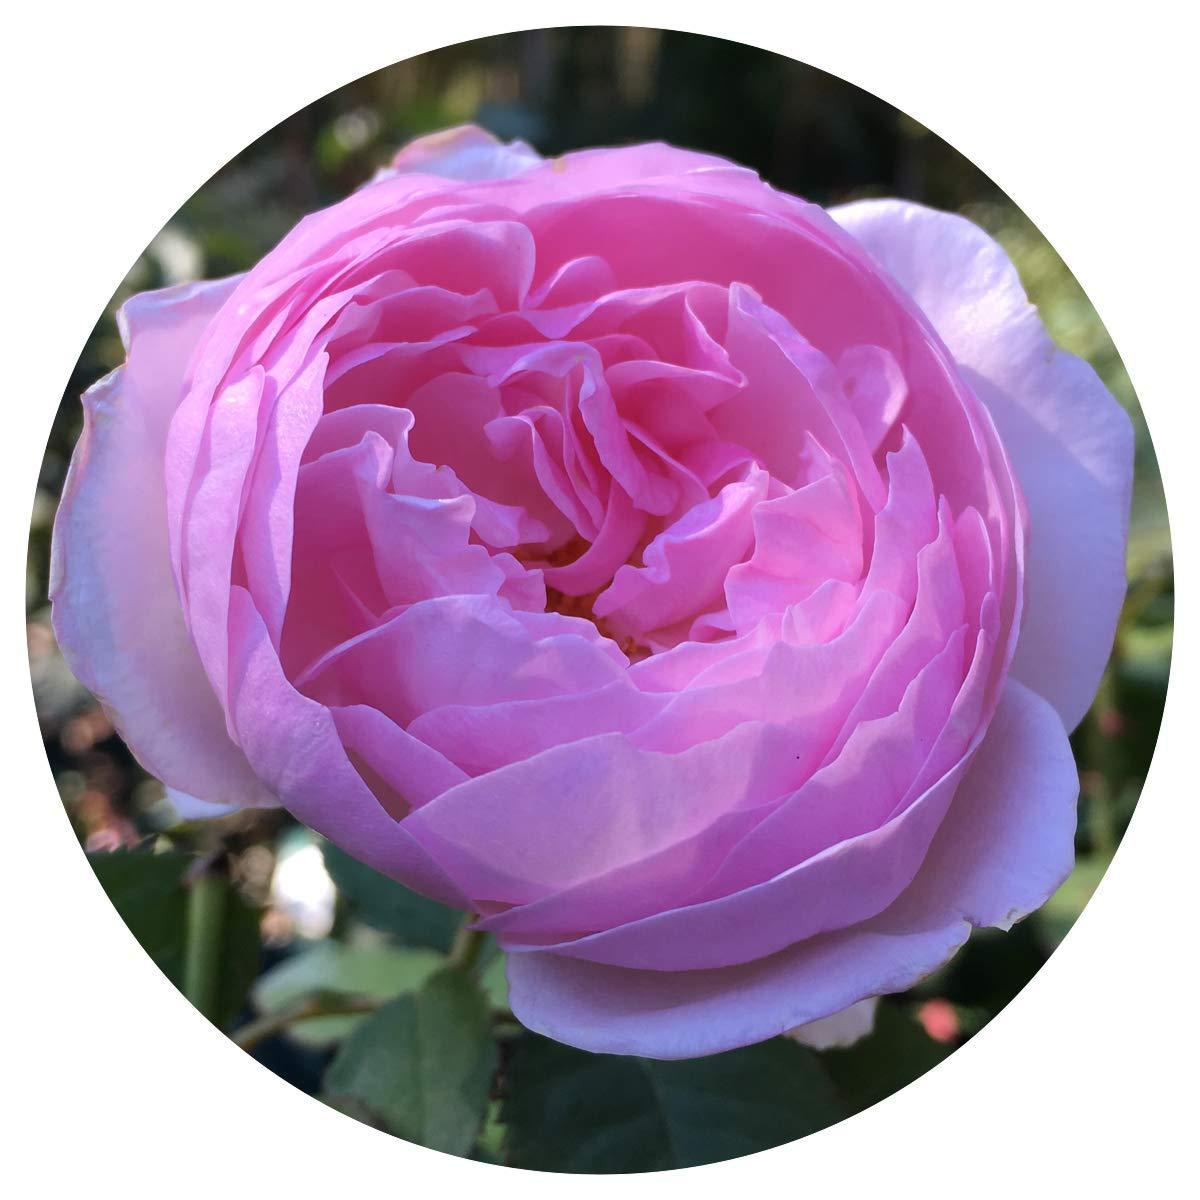 David Austin English Roses Olivia Rose Austin - New for 2016